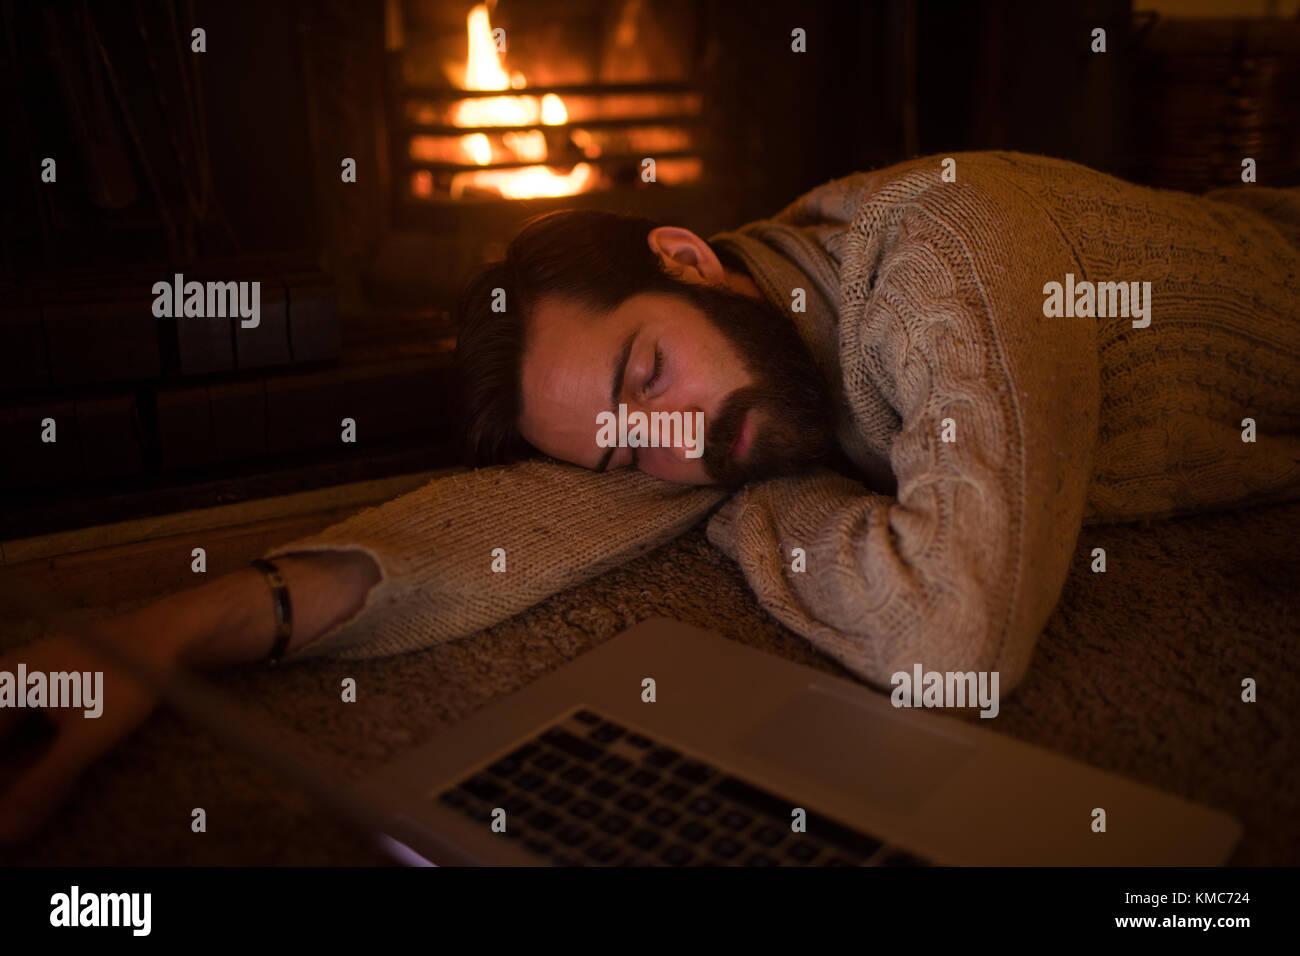 Man sleeping on floor in living room - Stock Image